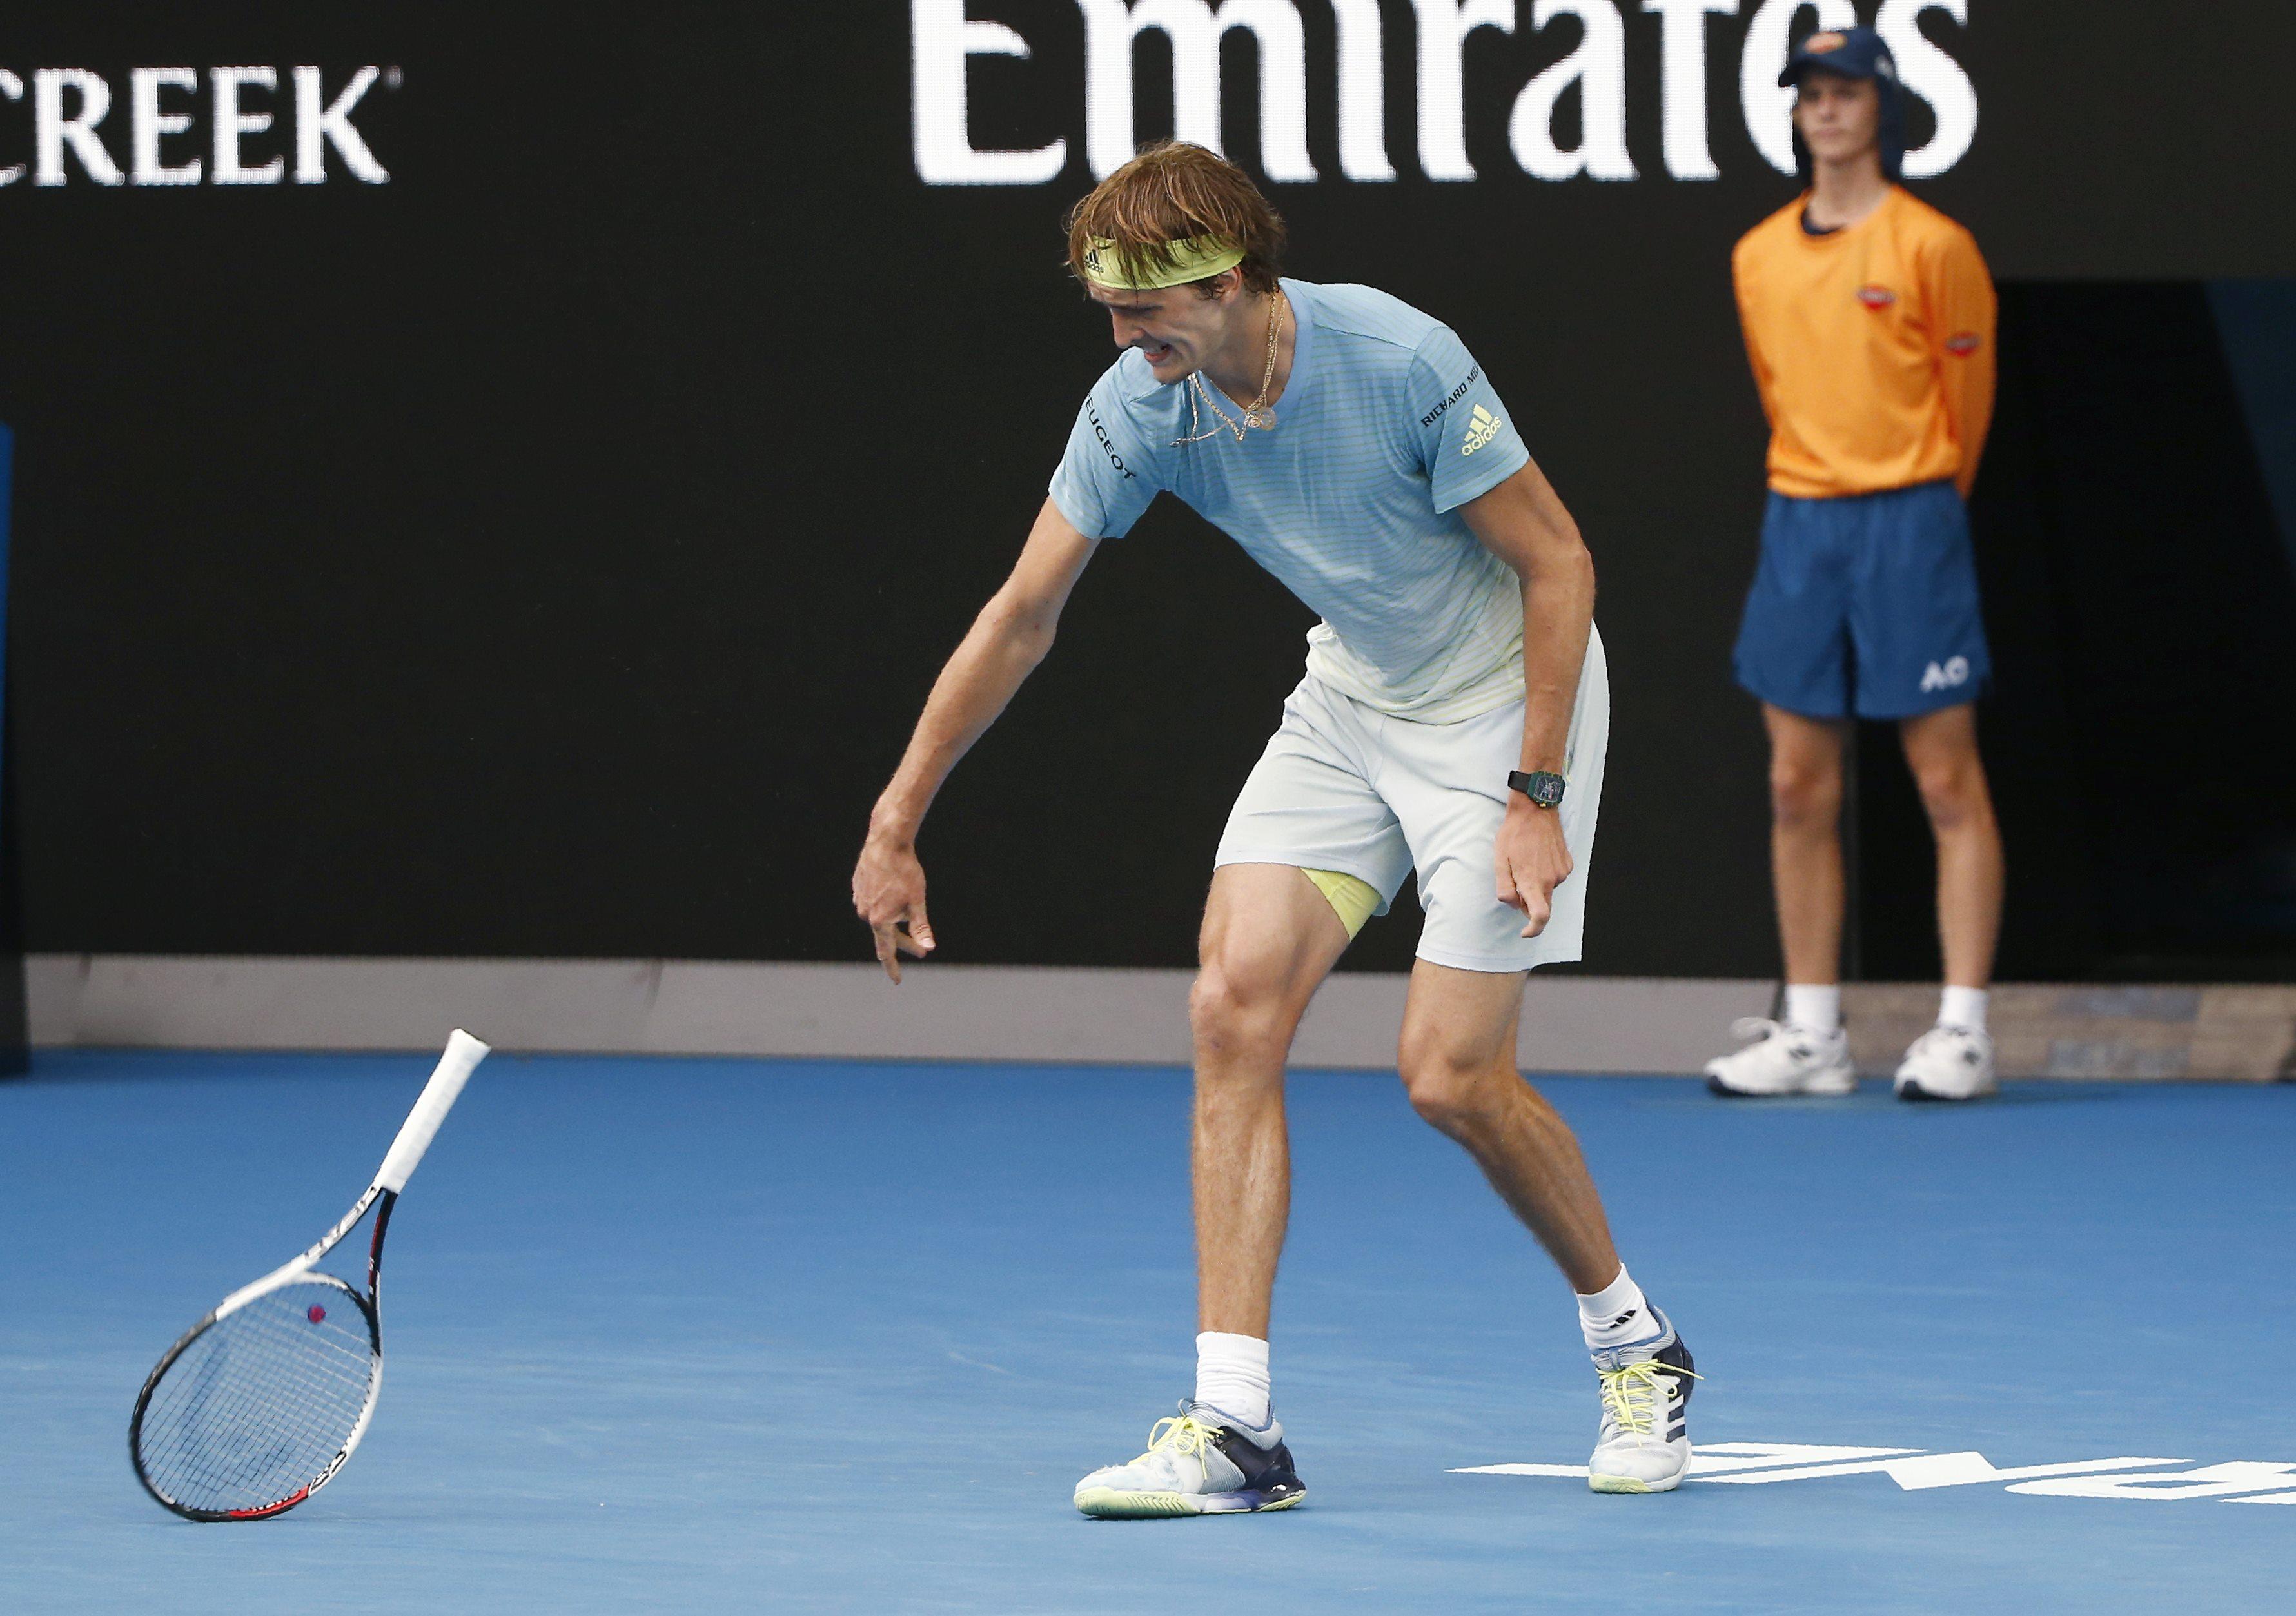 Tennis - Open Australie - Alexander Zverev n'y arrive toujours pas en Grand Chelem